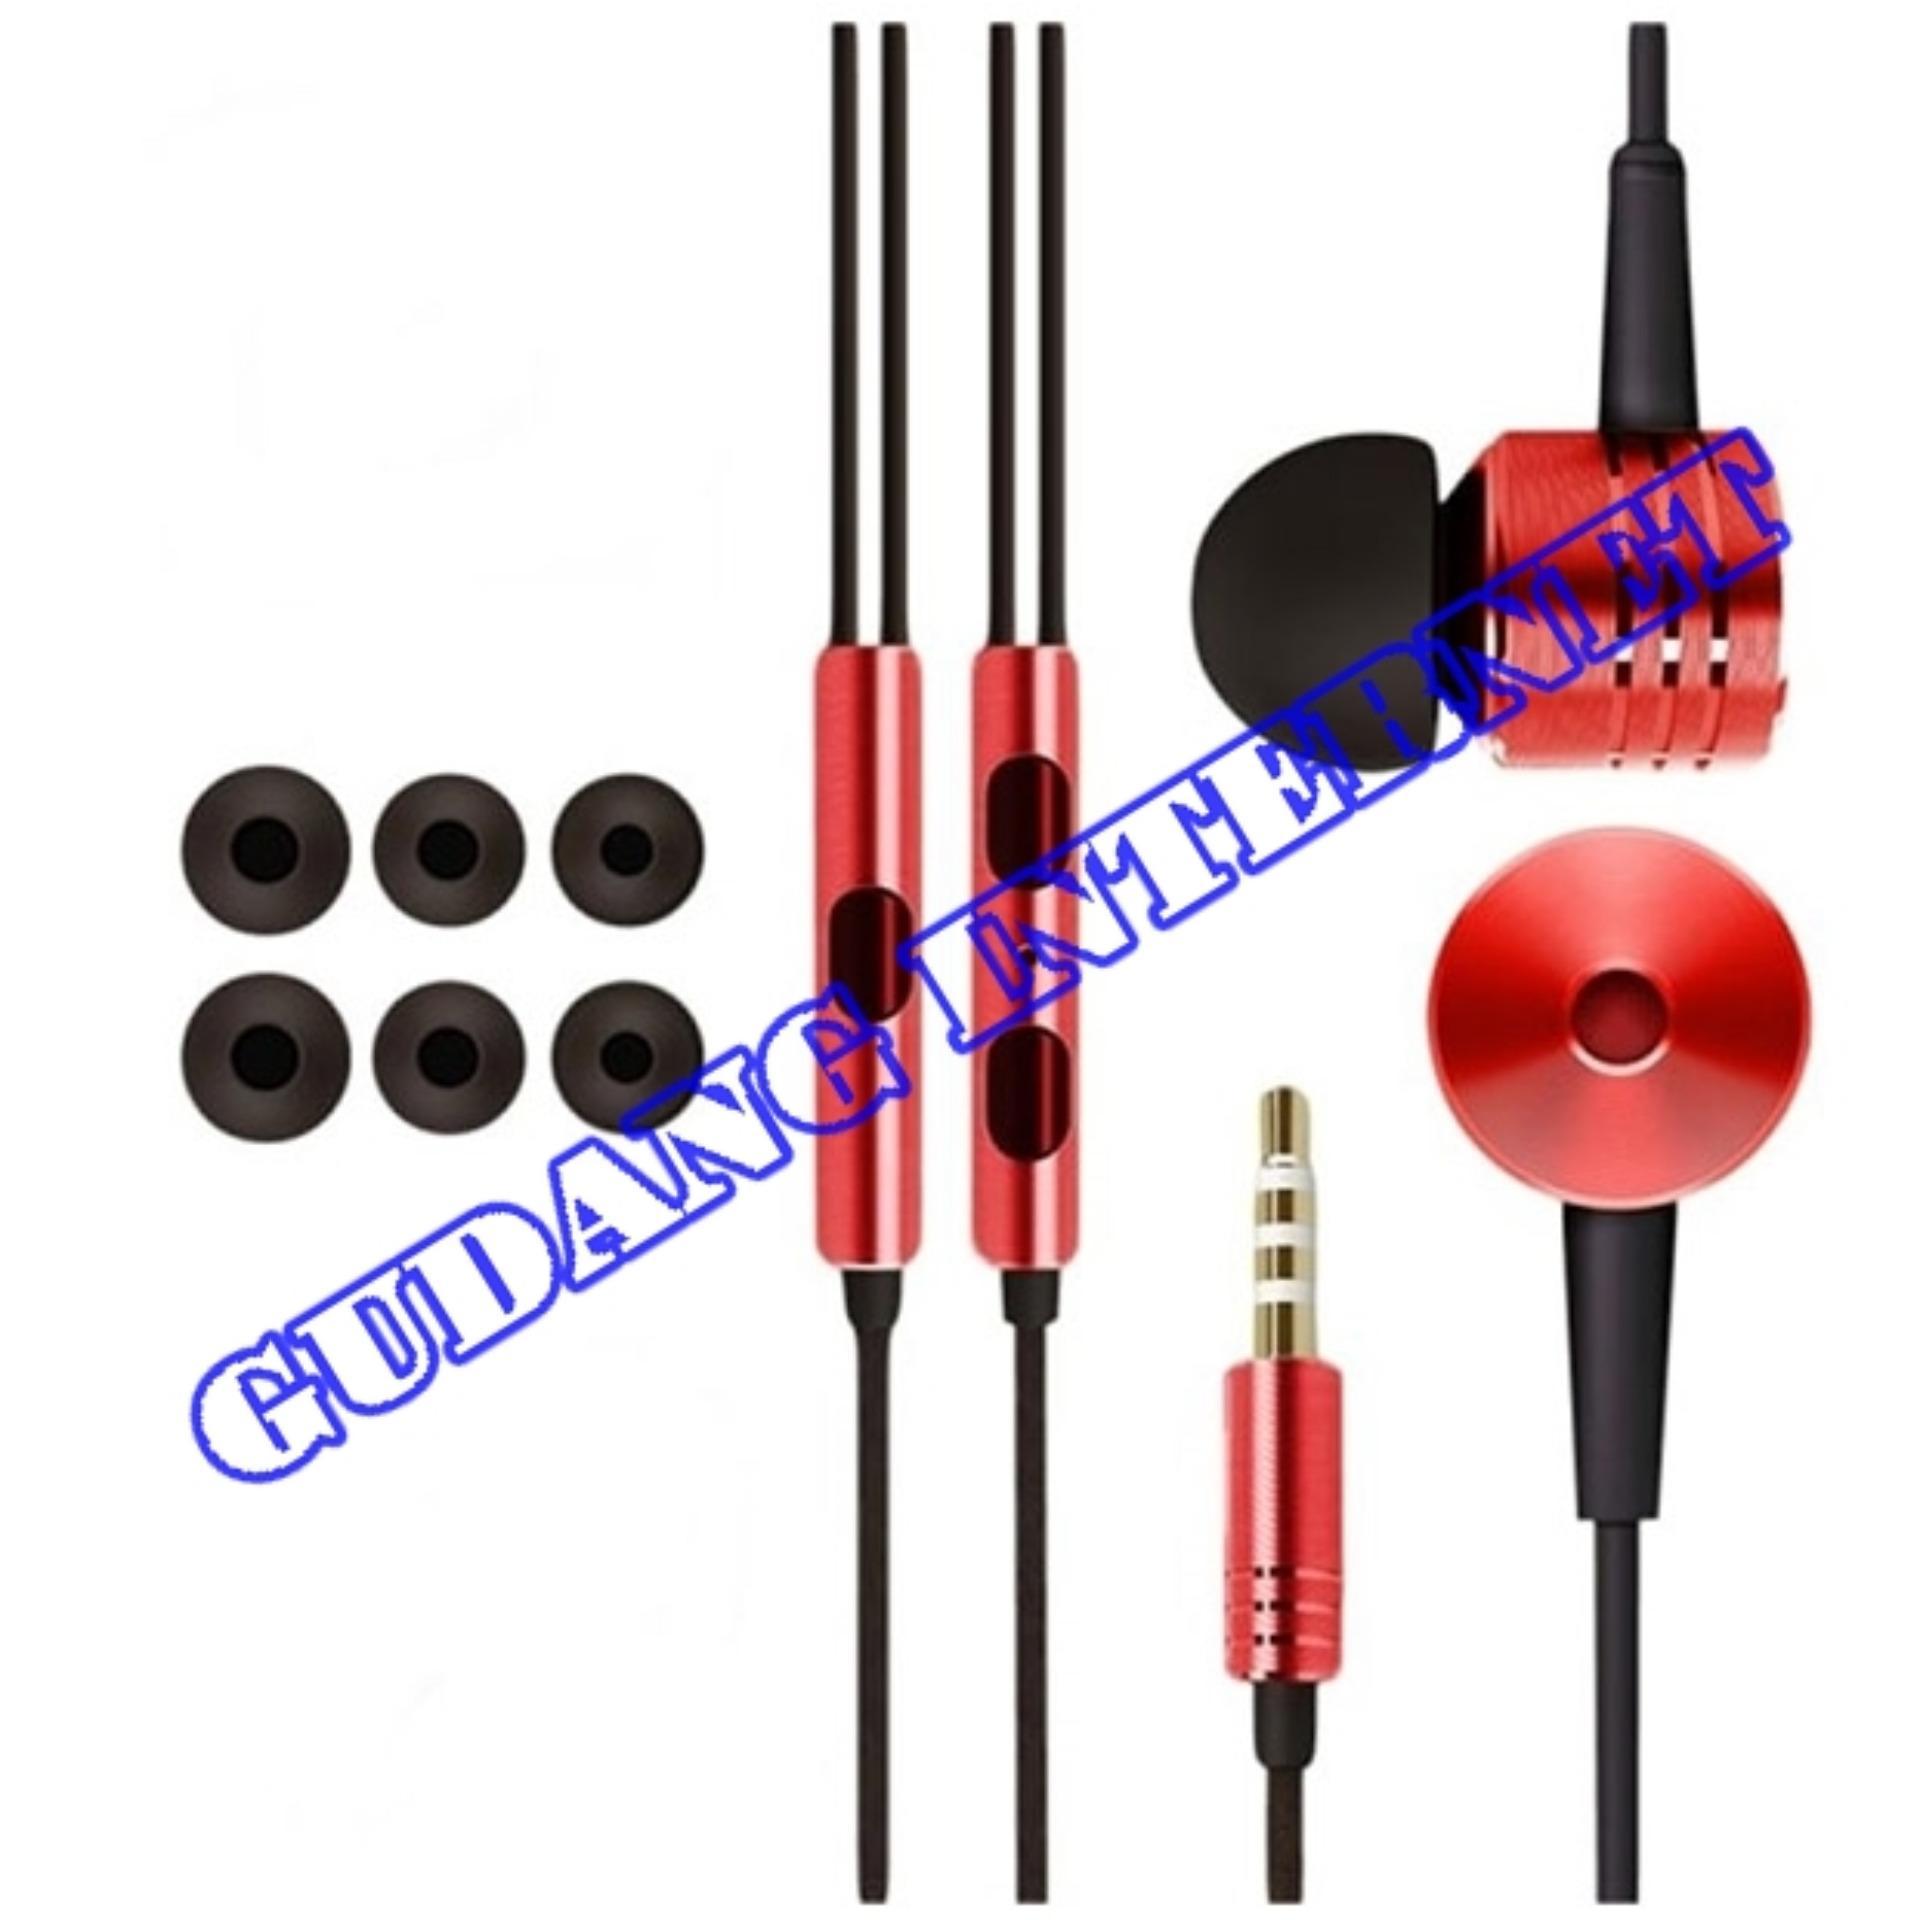 ... Xiaomi Earphone Big Bass Piston Mi 2nd Generation Handsfree/Headset- merah(RED) ...